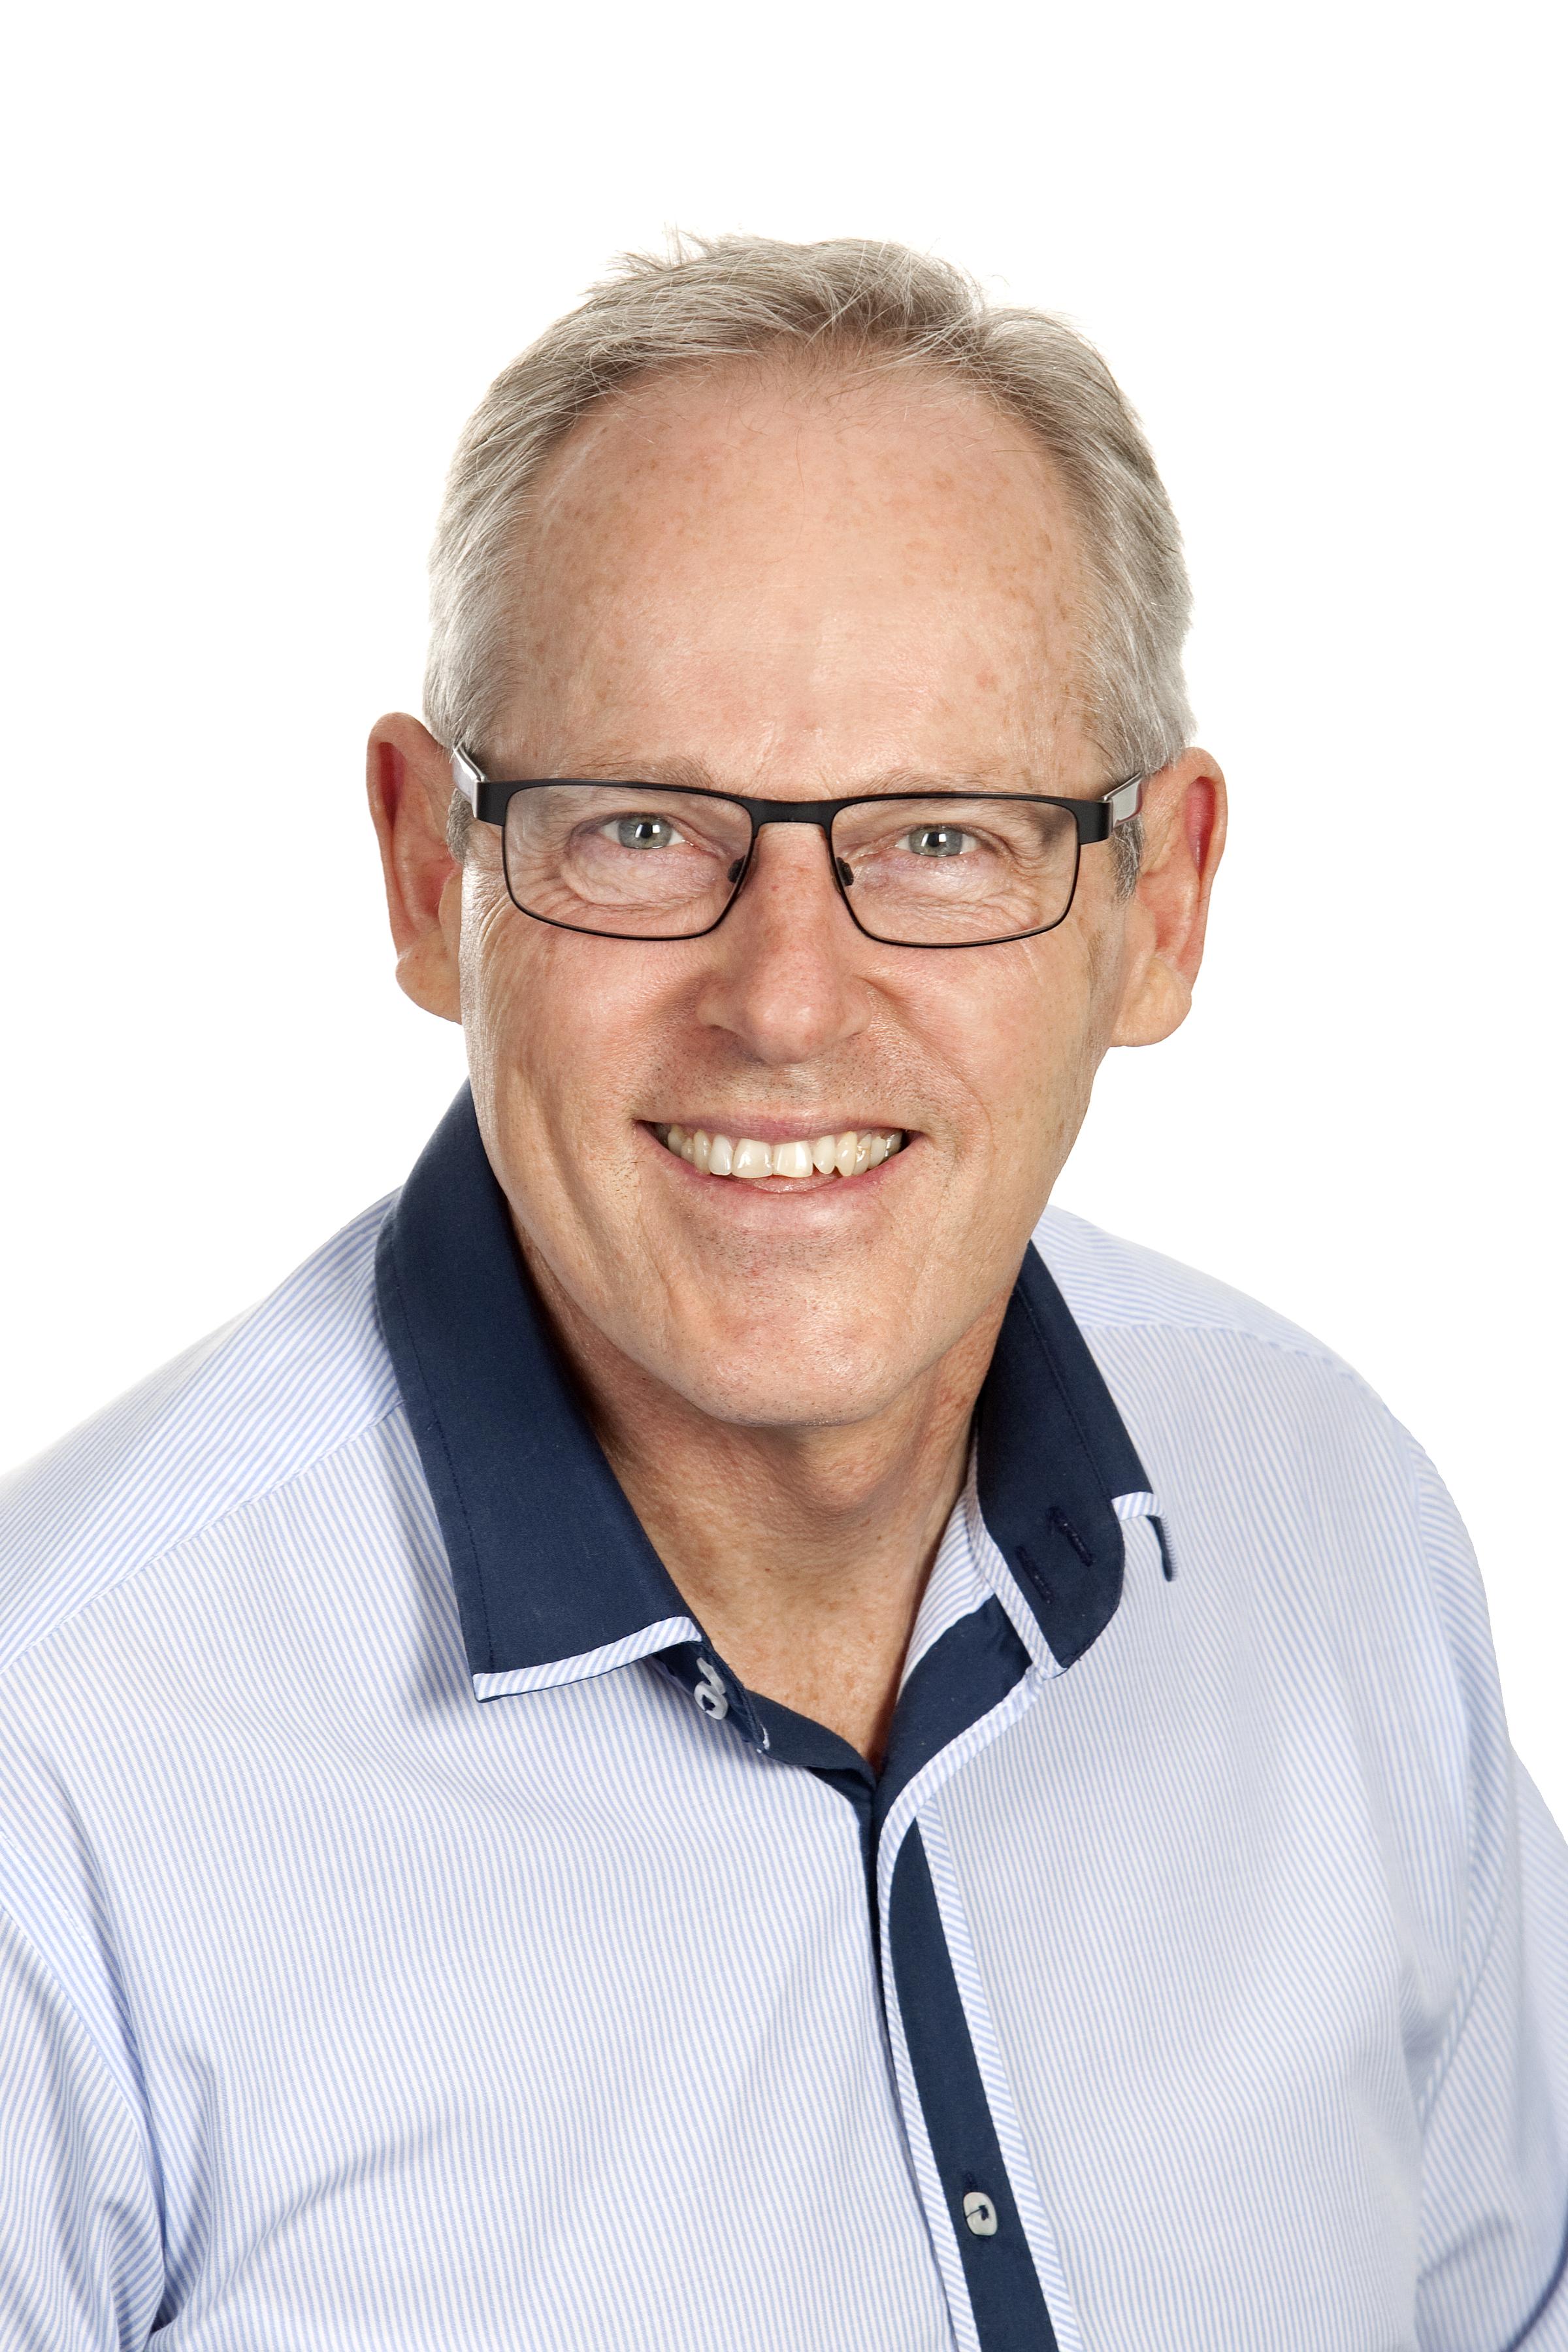 John drury, presenter, trainer, facilitator, mentor and author